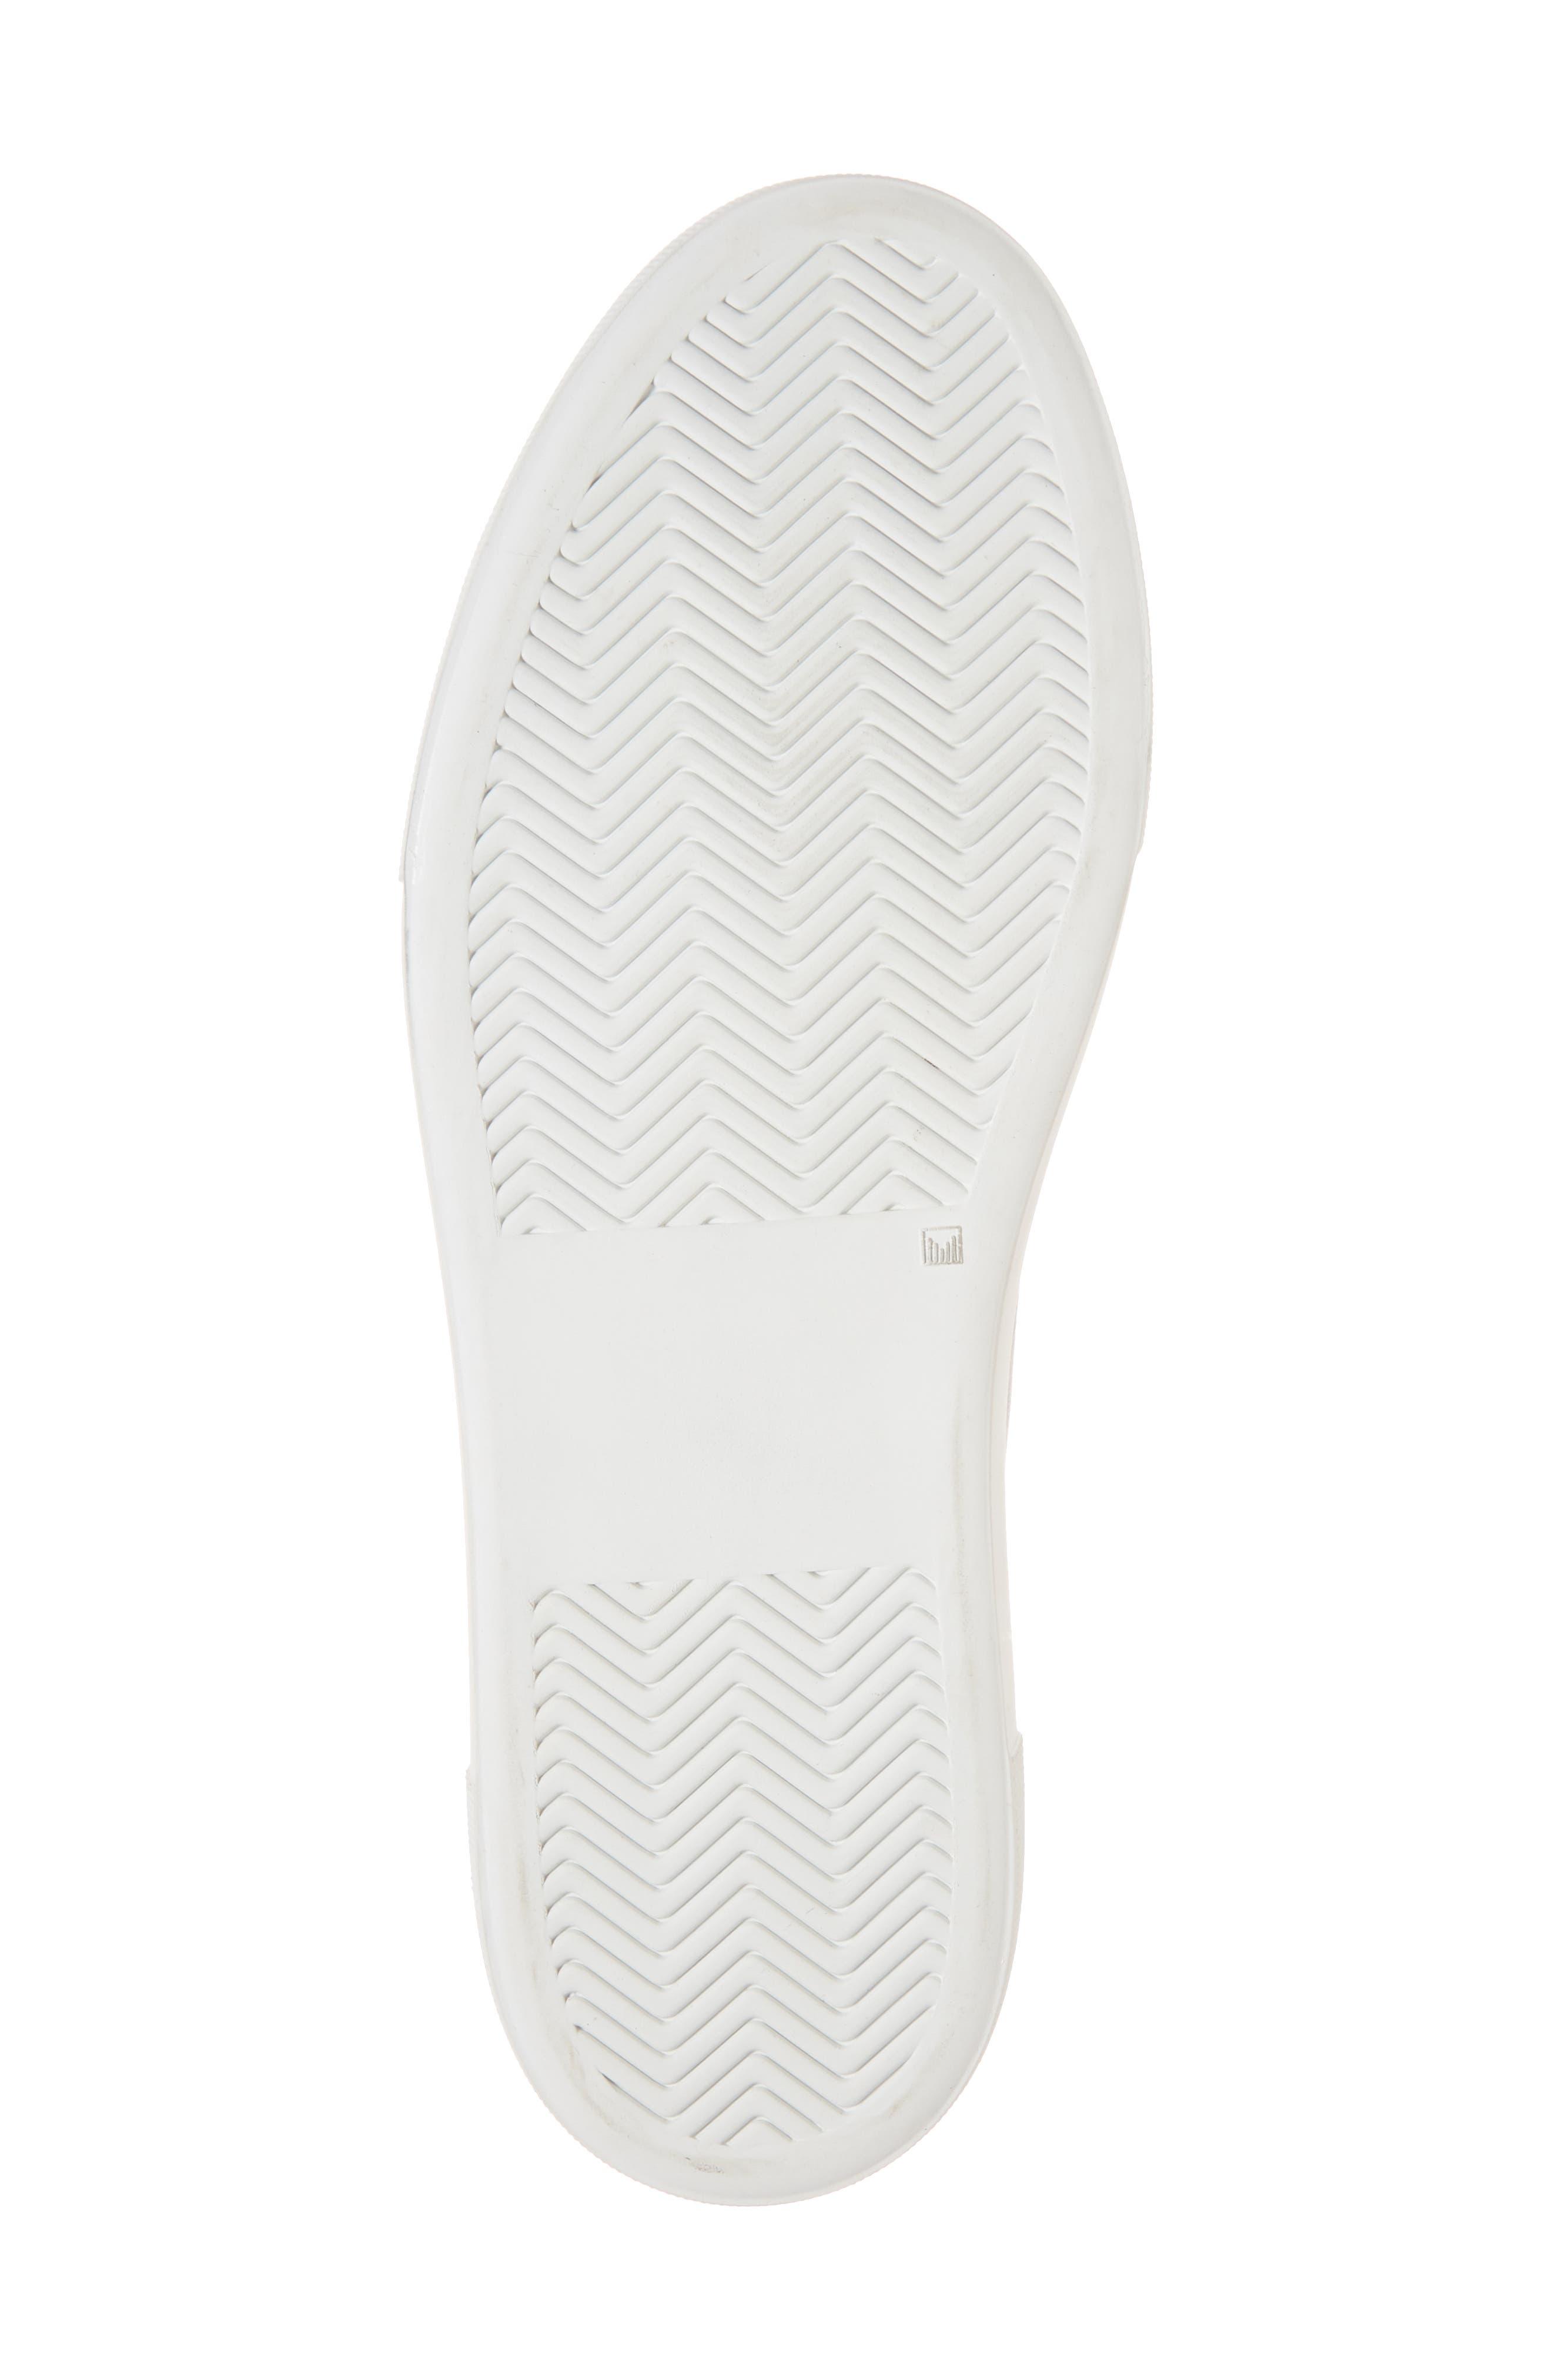 COMMON PROJECTS, Tournament High Super Sneaker, Alternate thumbnail 6, color, BLACK/ WHITE